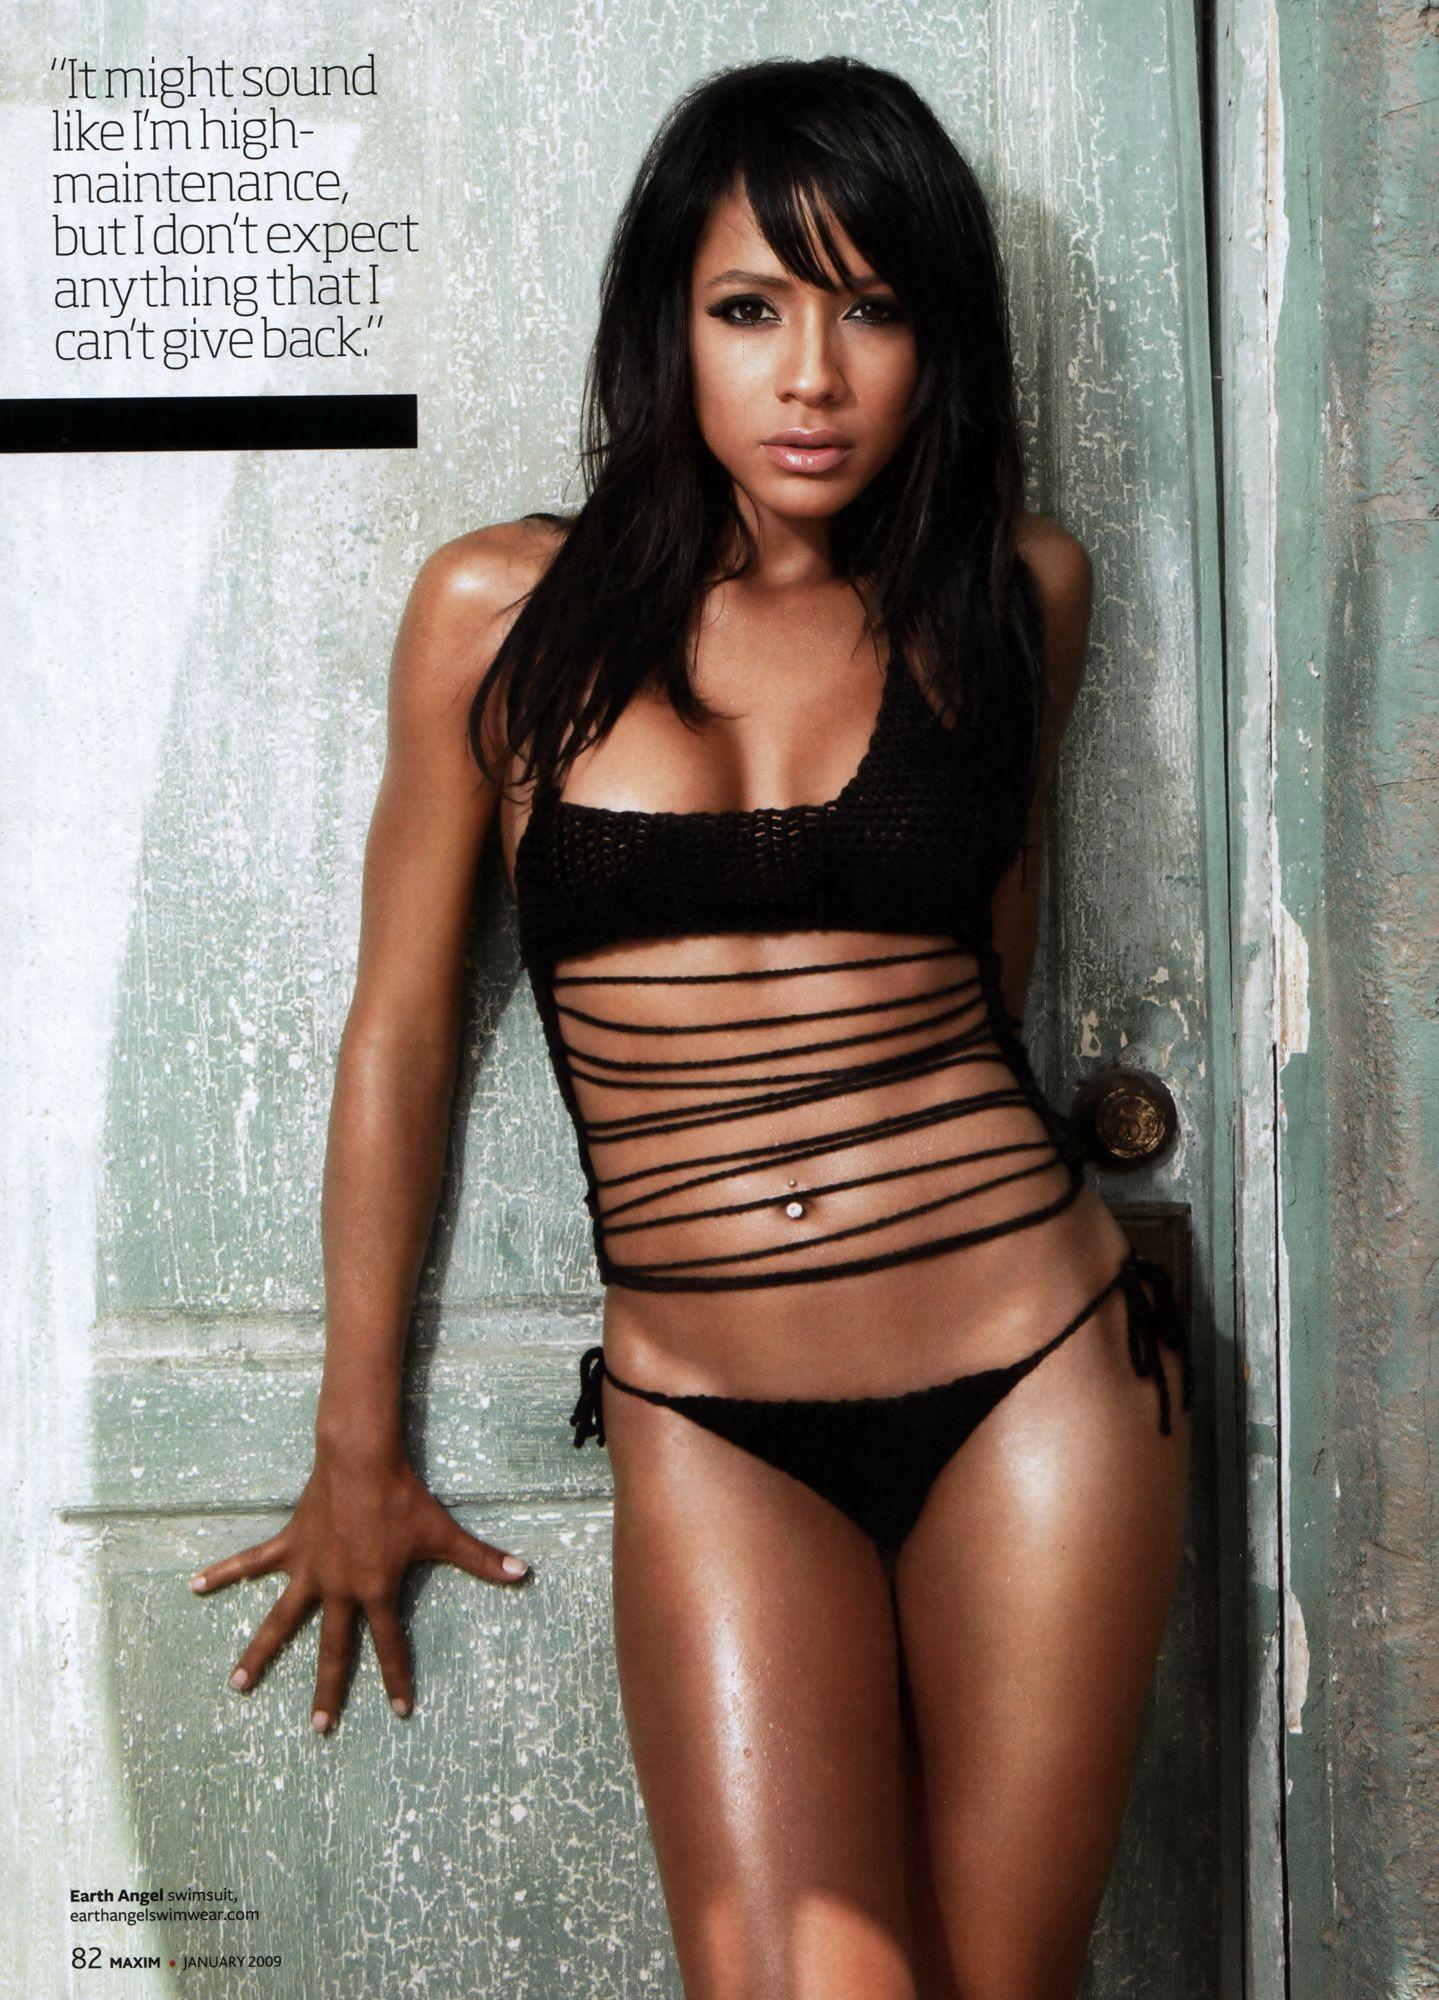 Bikini Dania Ramirez nudes (43 photo), Tits, Paparazzi, Feet, underwear 2006